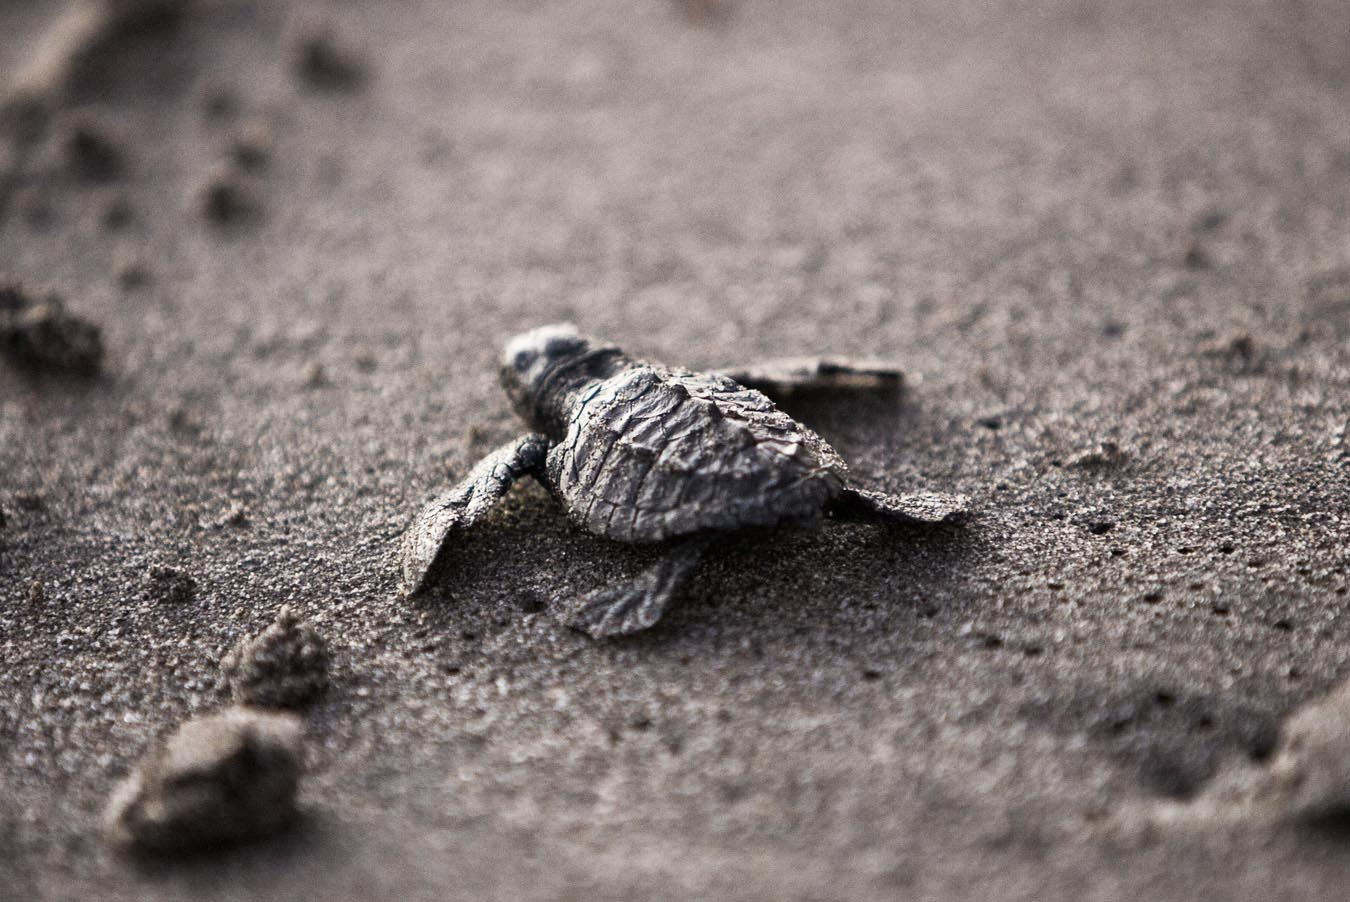 So stark bedroht unser Plastikmüll junge Meeresschildkröten